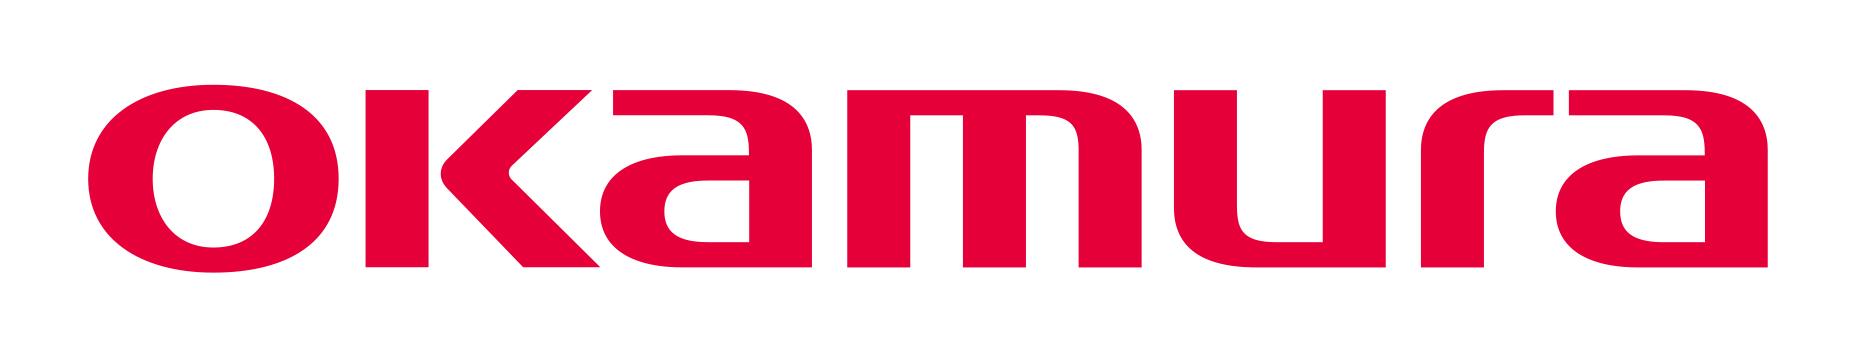 okamrua_logo_英文